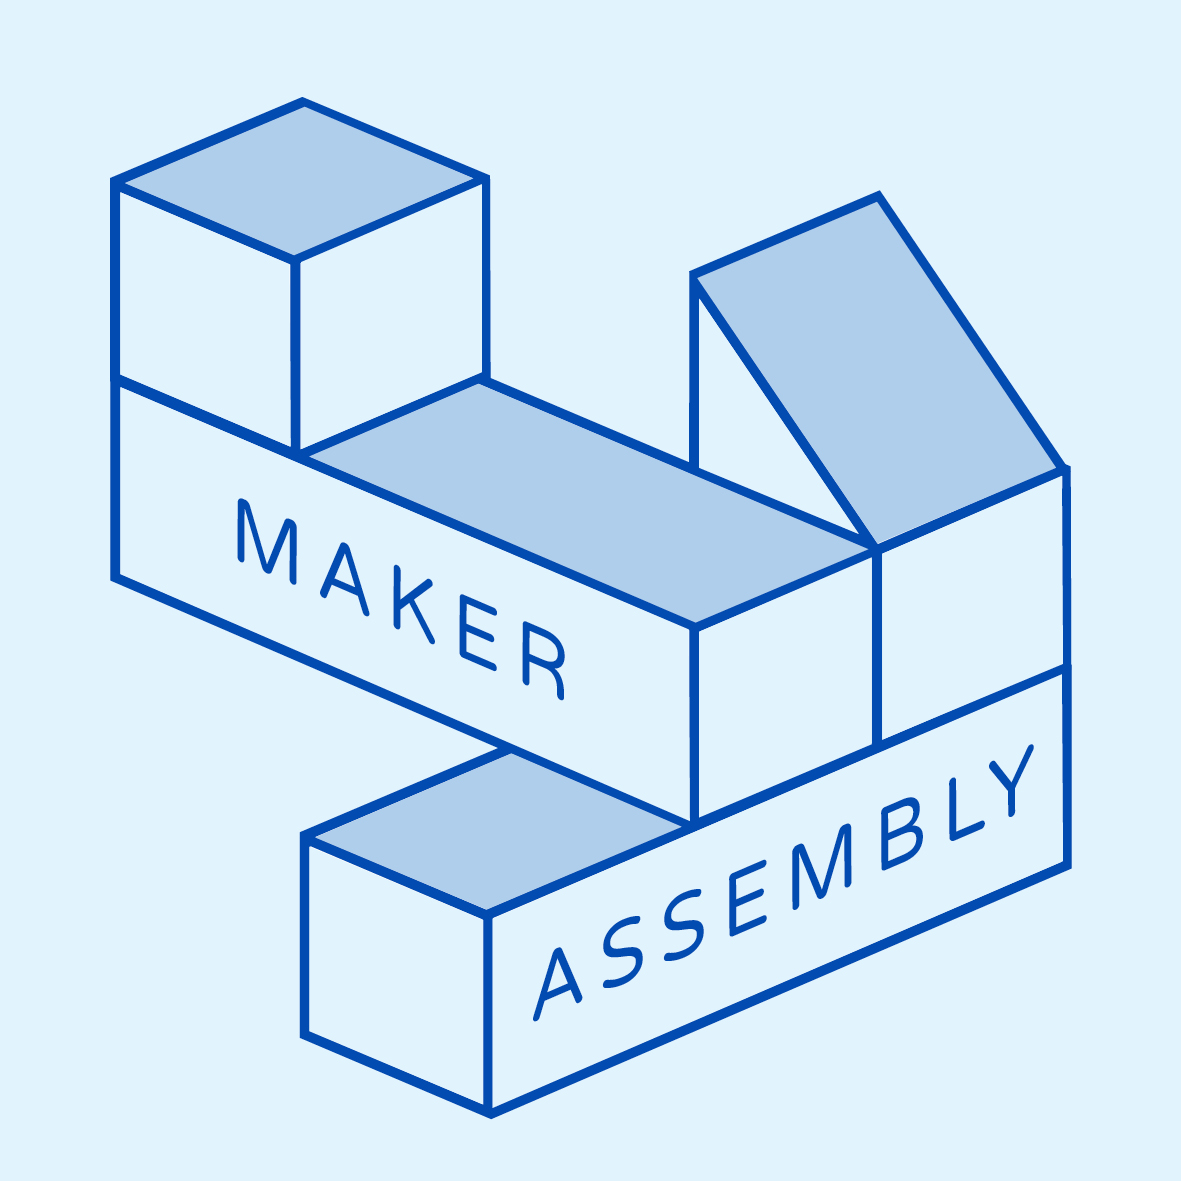 Maker Assembly logo, blue